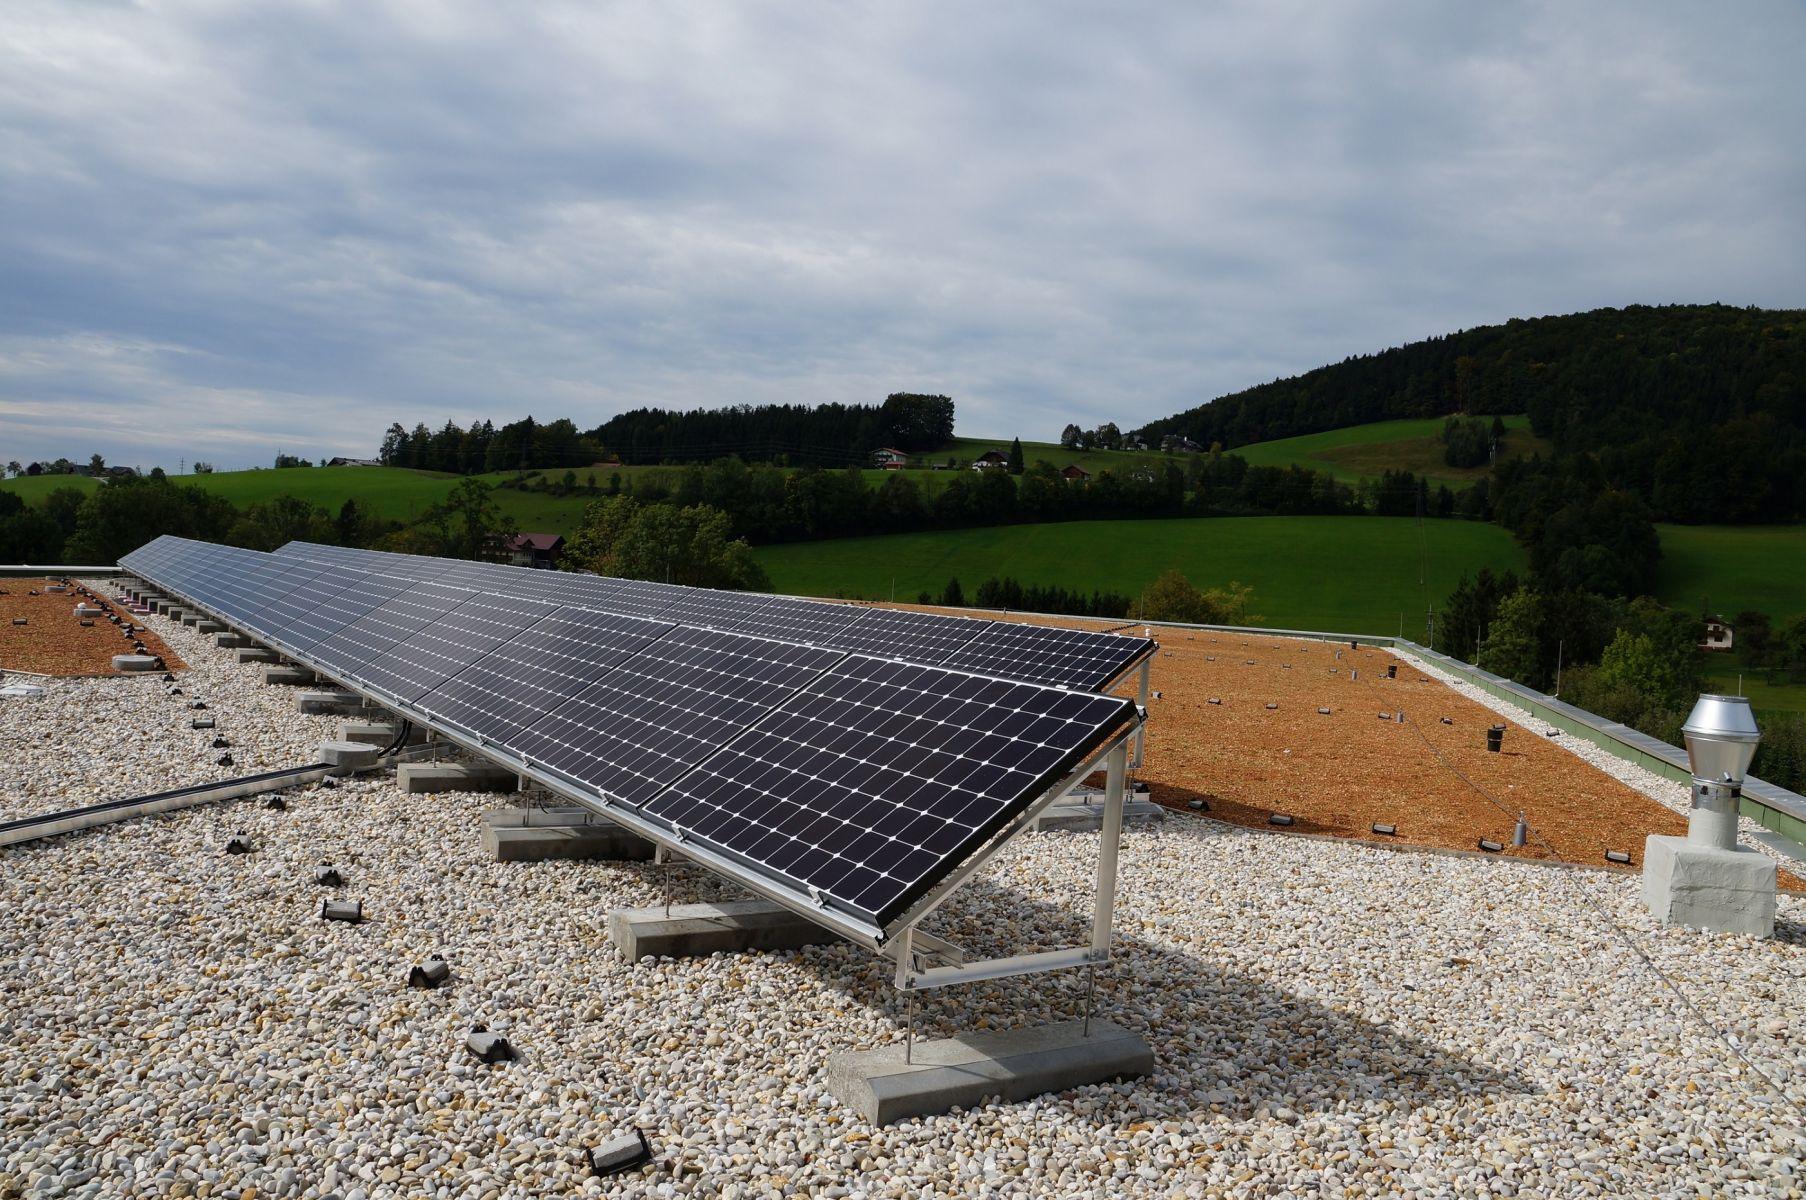 photovoltaikmodule sunpower net neue energie technik. Black Bedroom Furniture Sets. Home Design Ideas